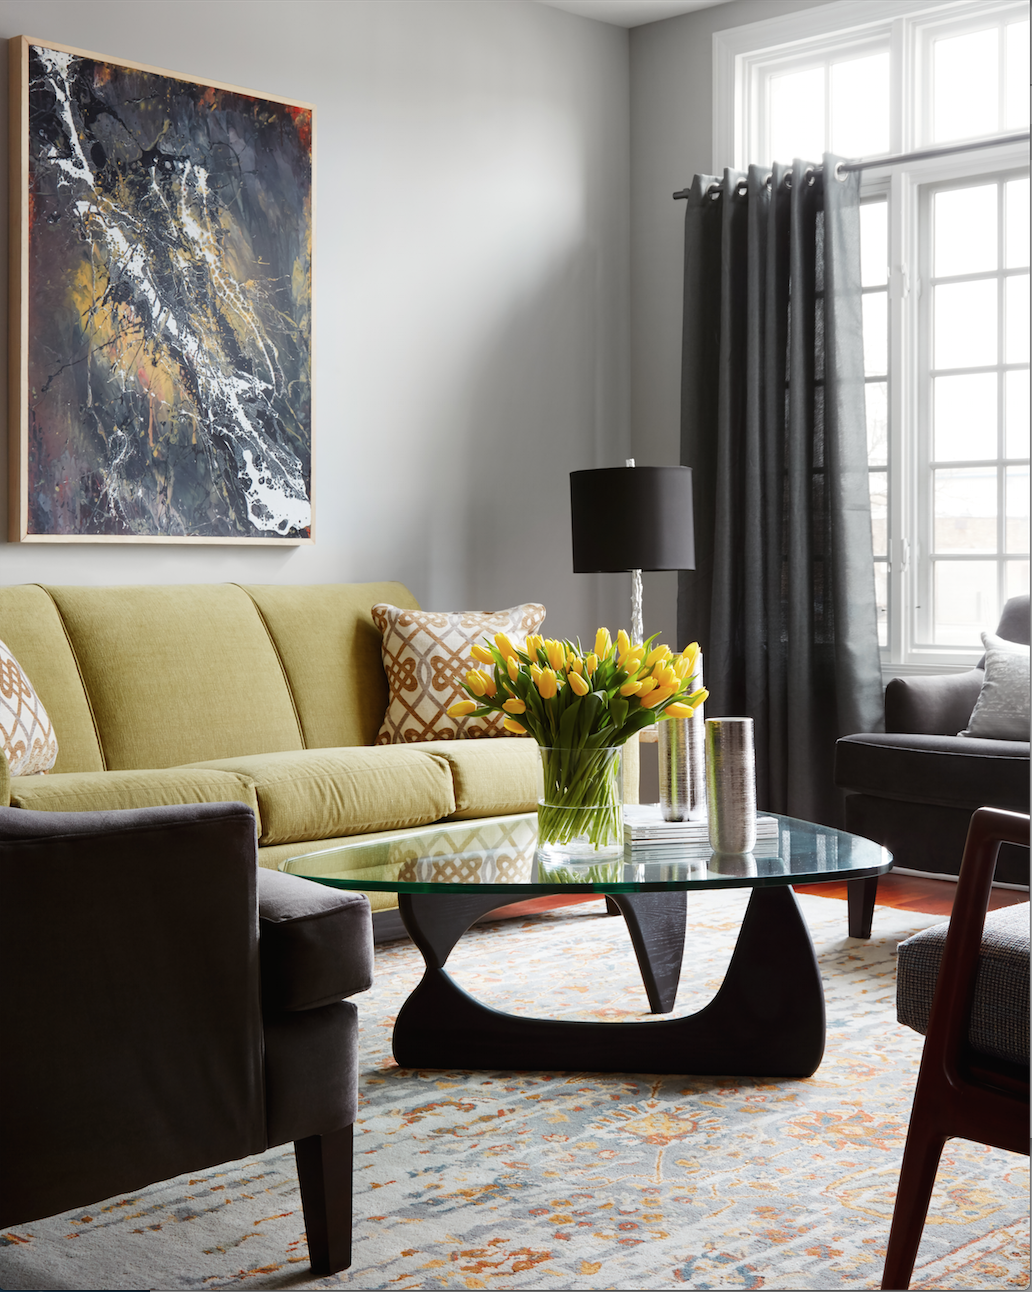 Living Room - Interior Design - Art Curation by Paula Interiors